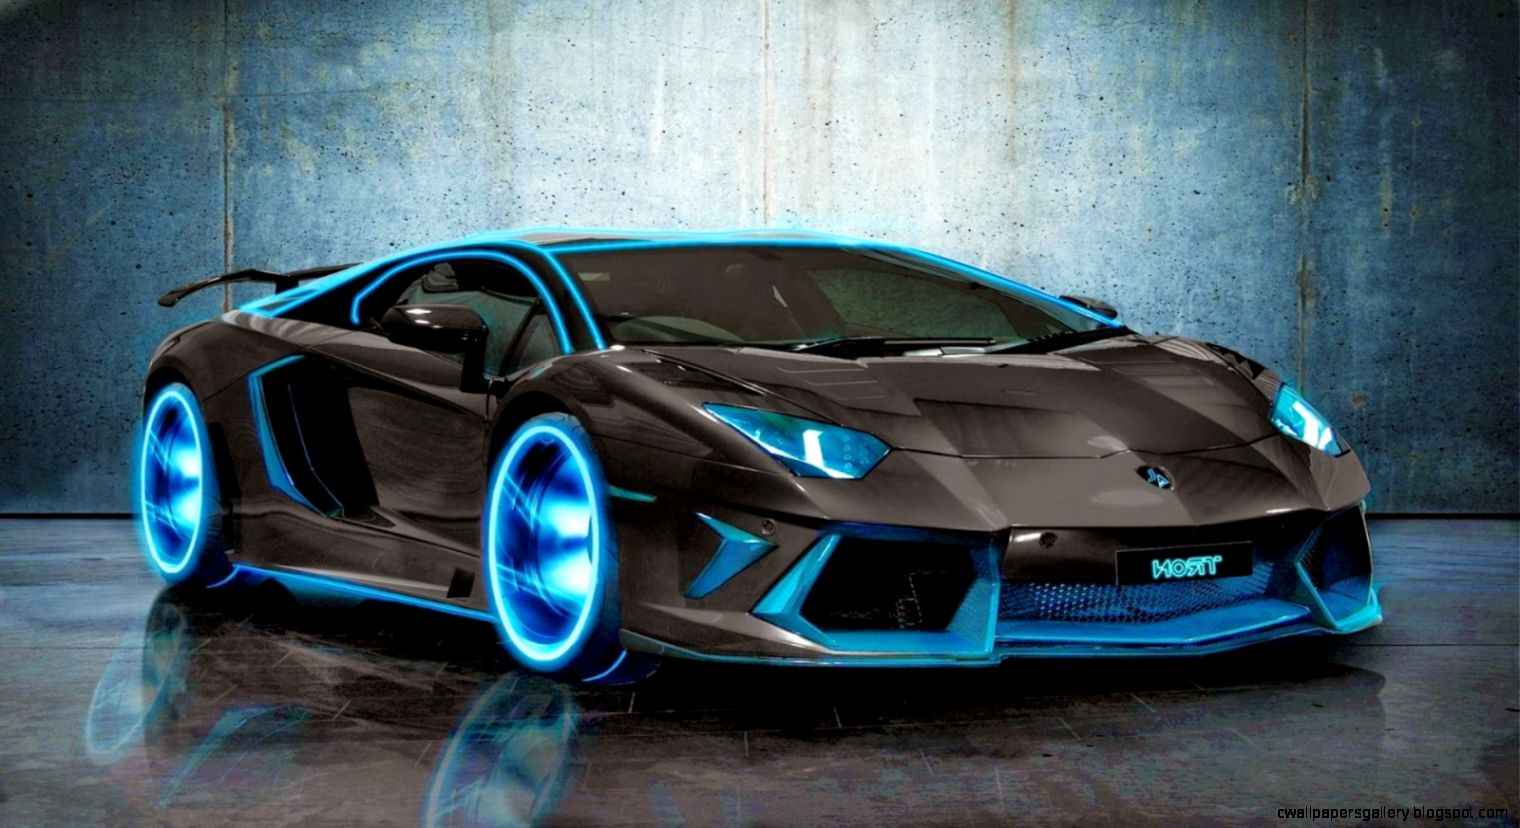 Tron Lamborghini Aventador Wallpaper Wallpapers Gallery